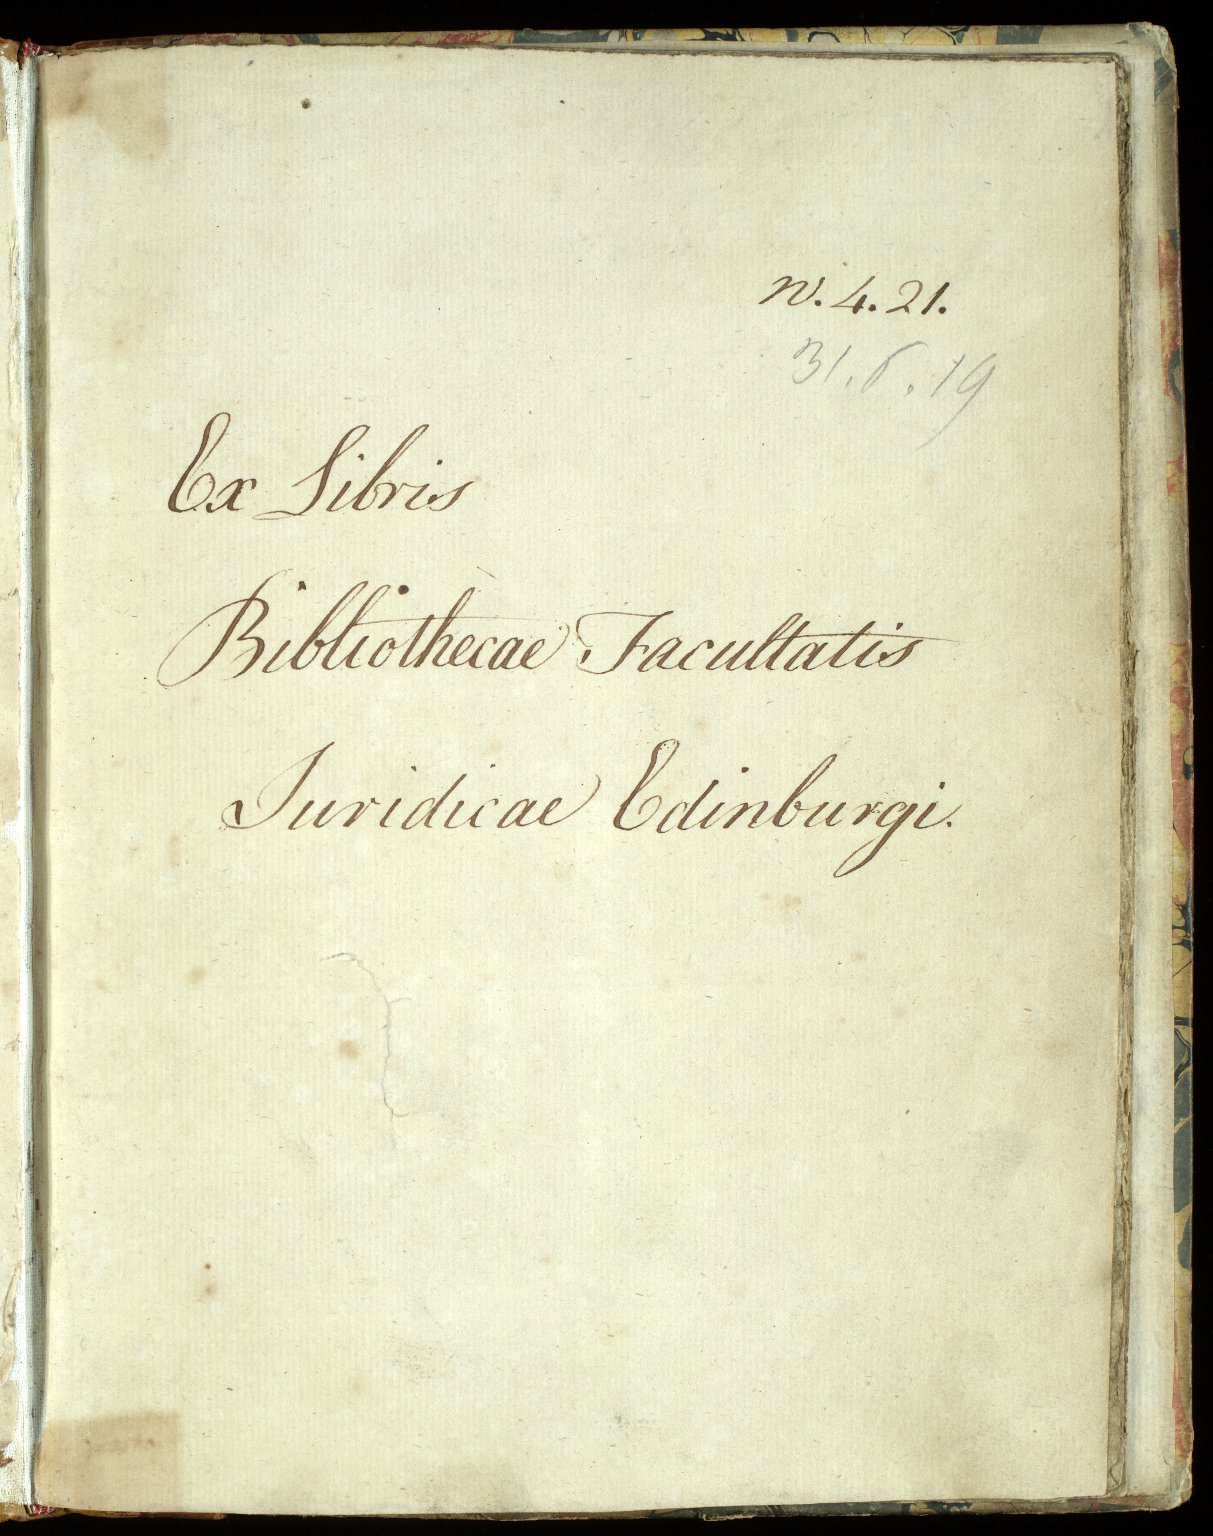 Provincia Edinburgena descriptio. [1 of 7]